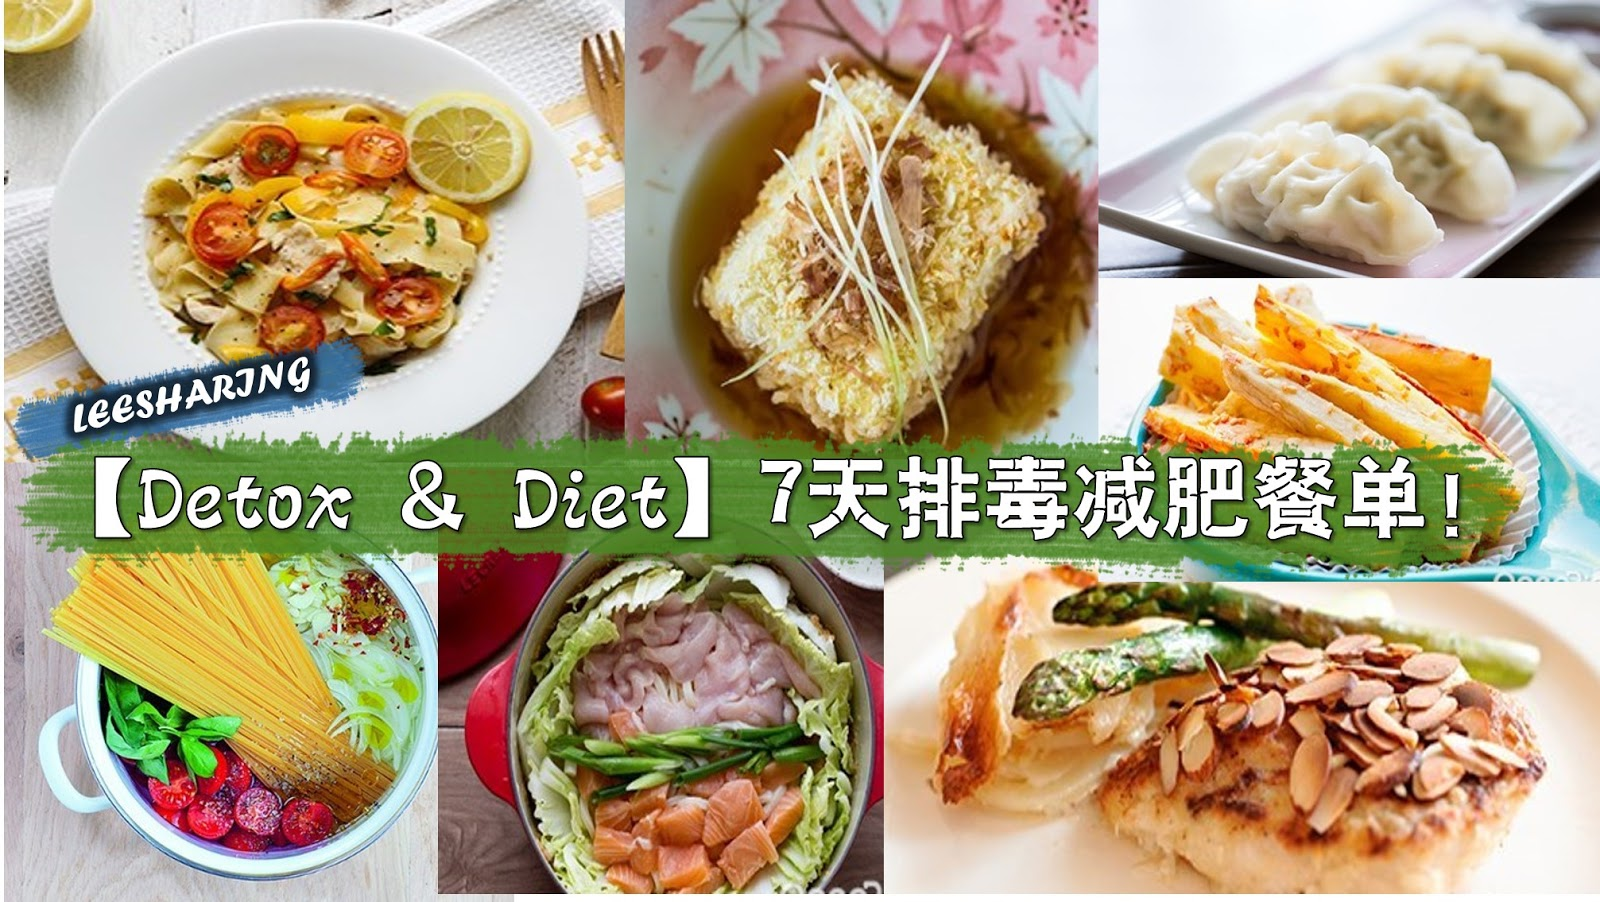 【Detox & Diet】7天排毒減肥餐單!你接受挑戰嗎? - Leesharing